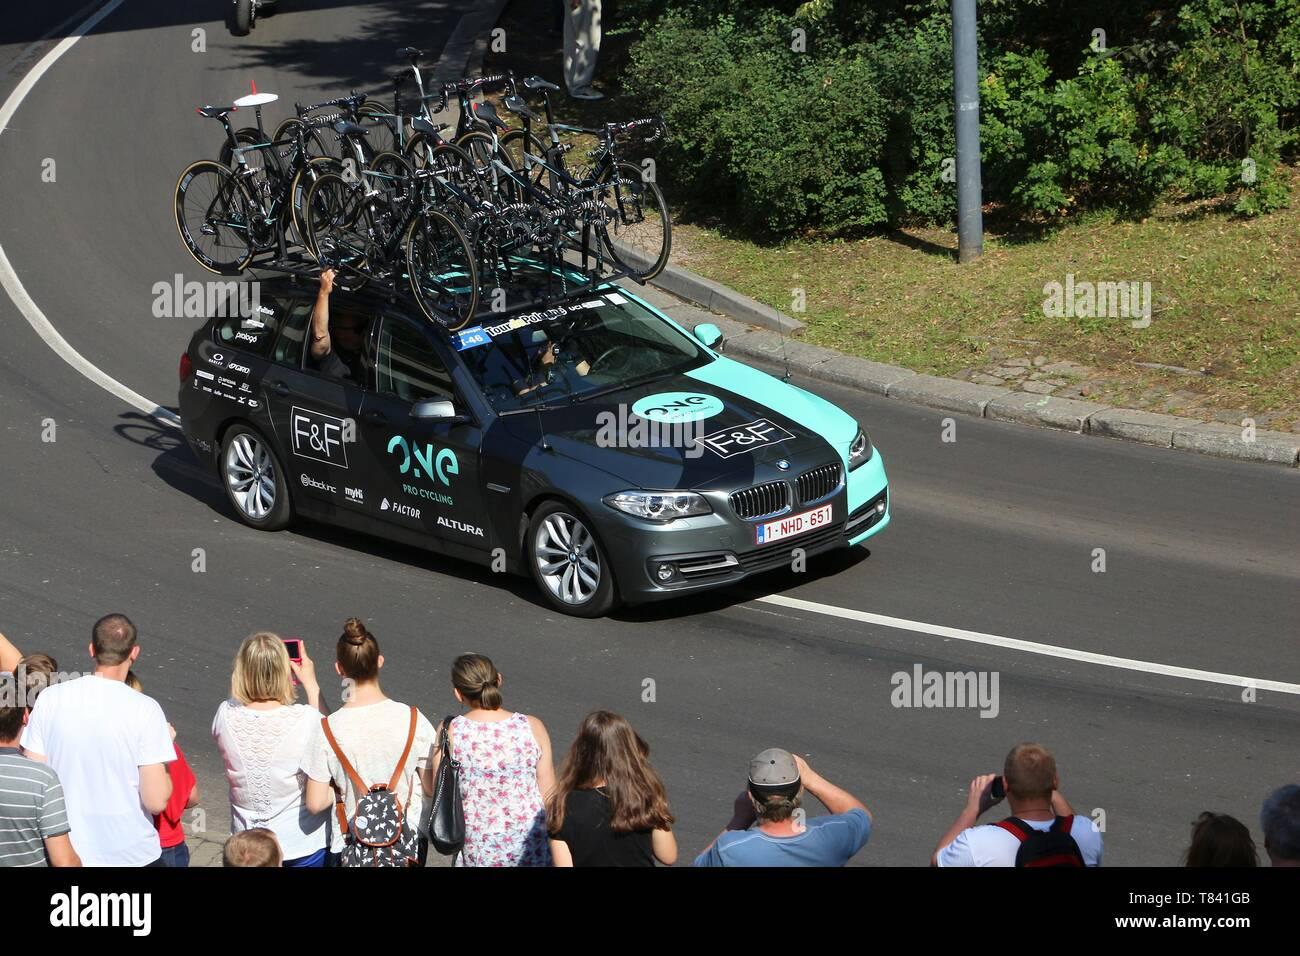 a74149d2f Cycling Team Car Stock Photos   Cycling Team Car Stock Images - Alamy